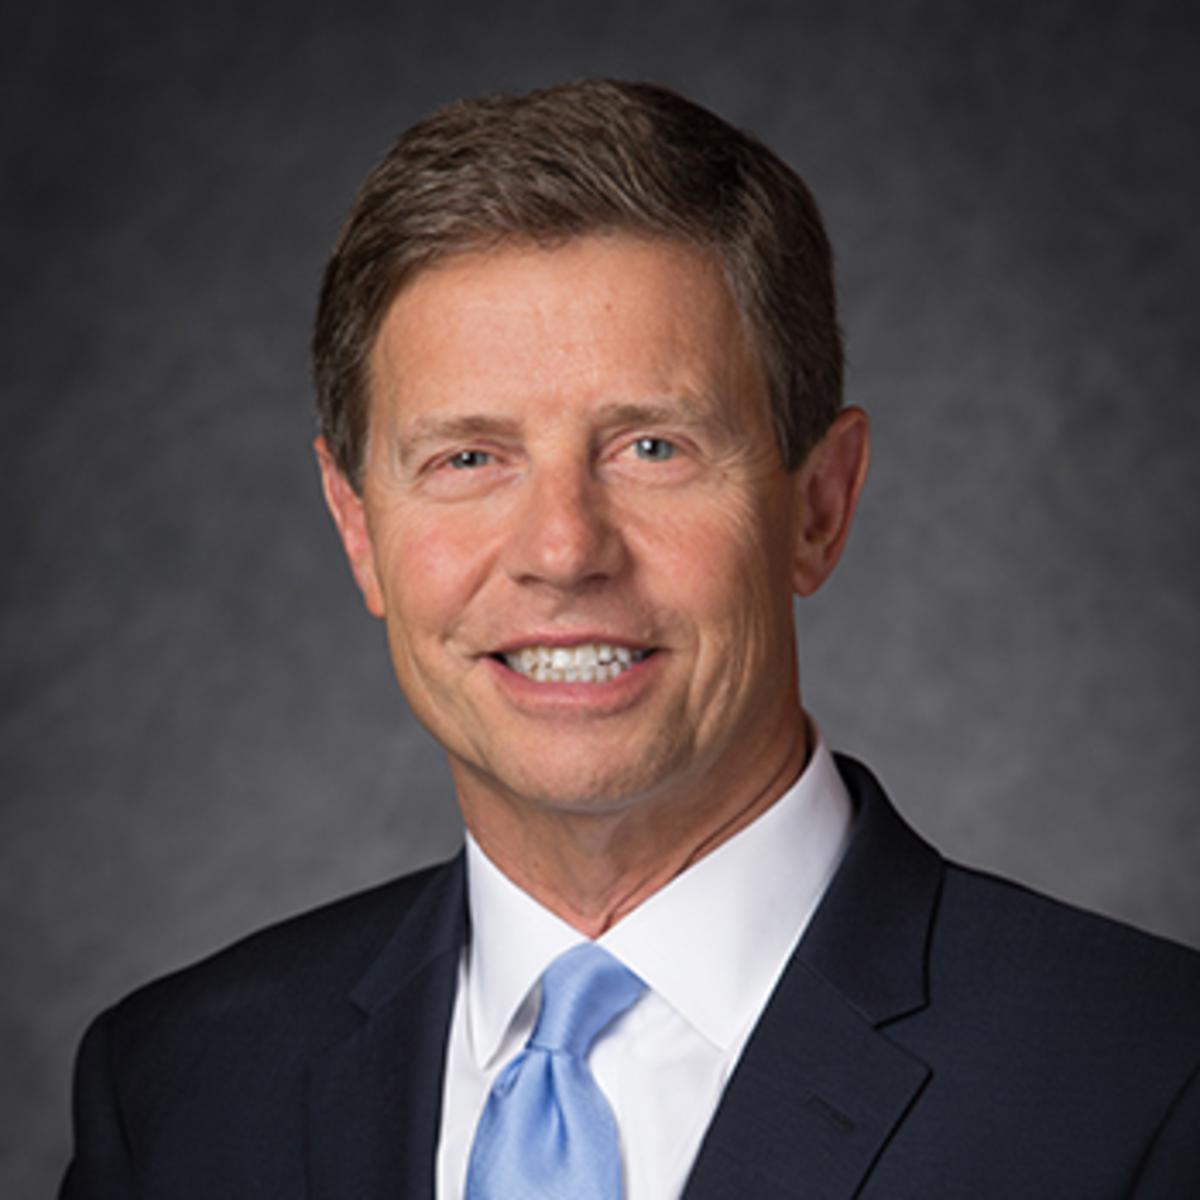 S. Mark Palmer